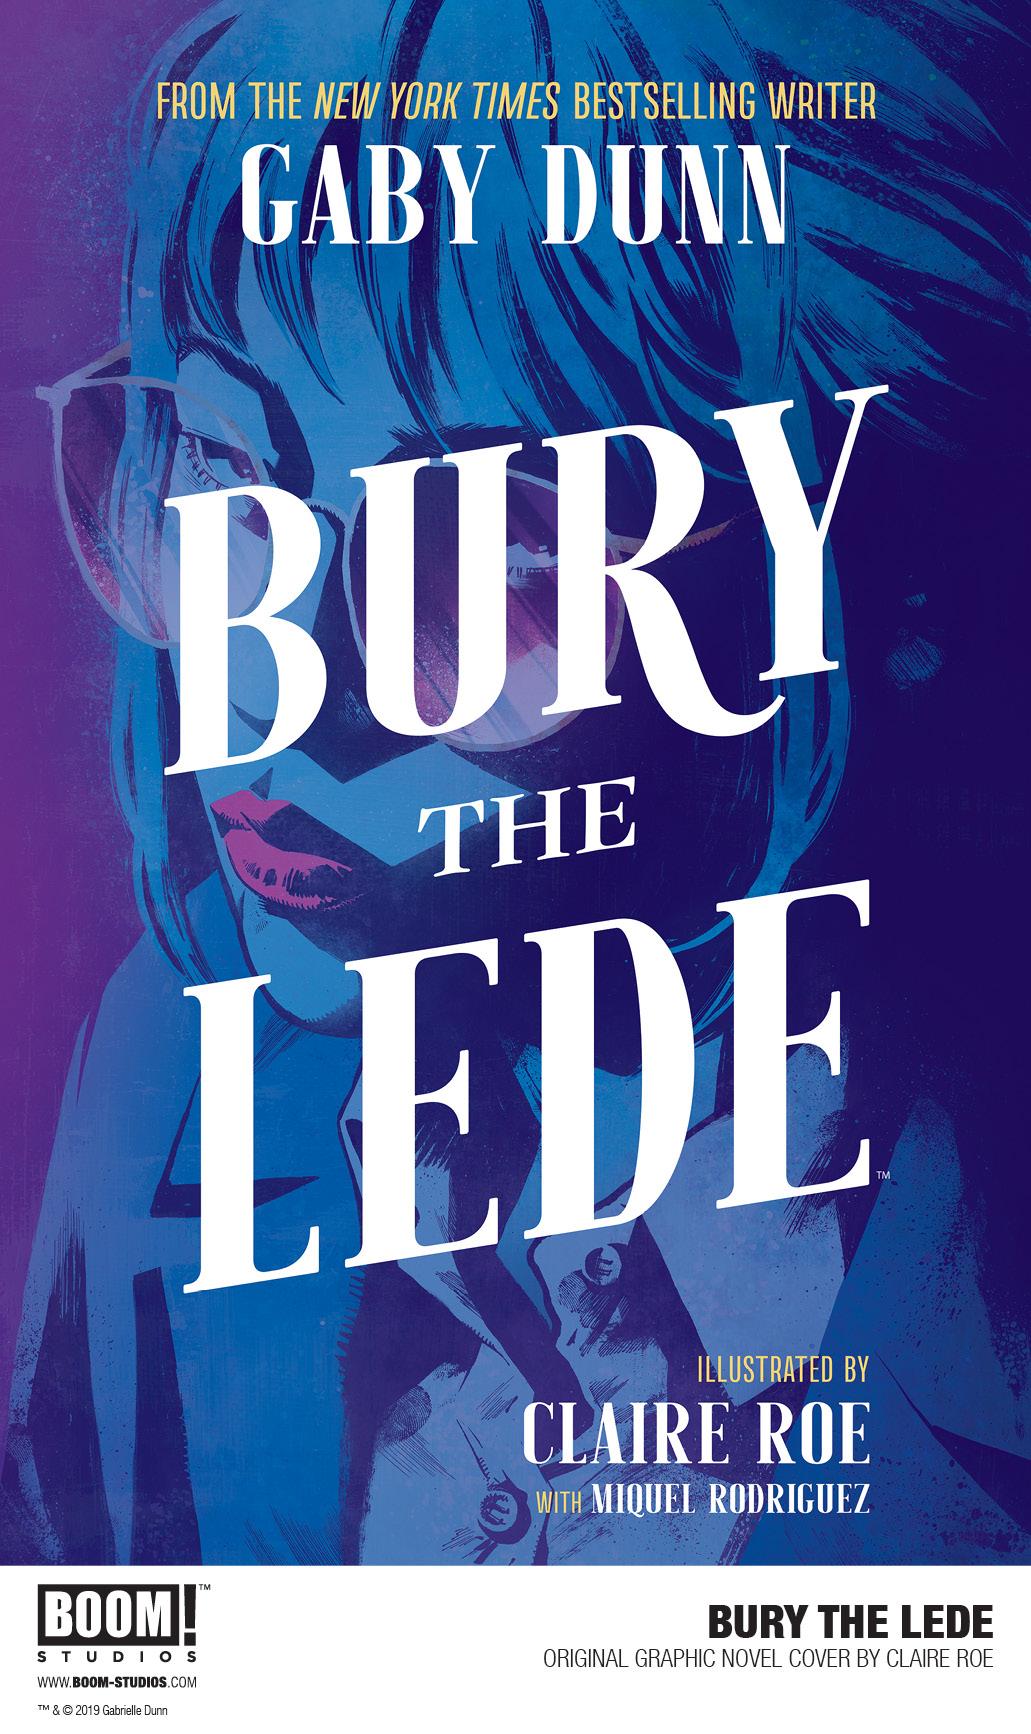 Bury the Lede